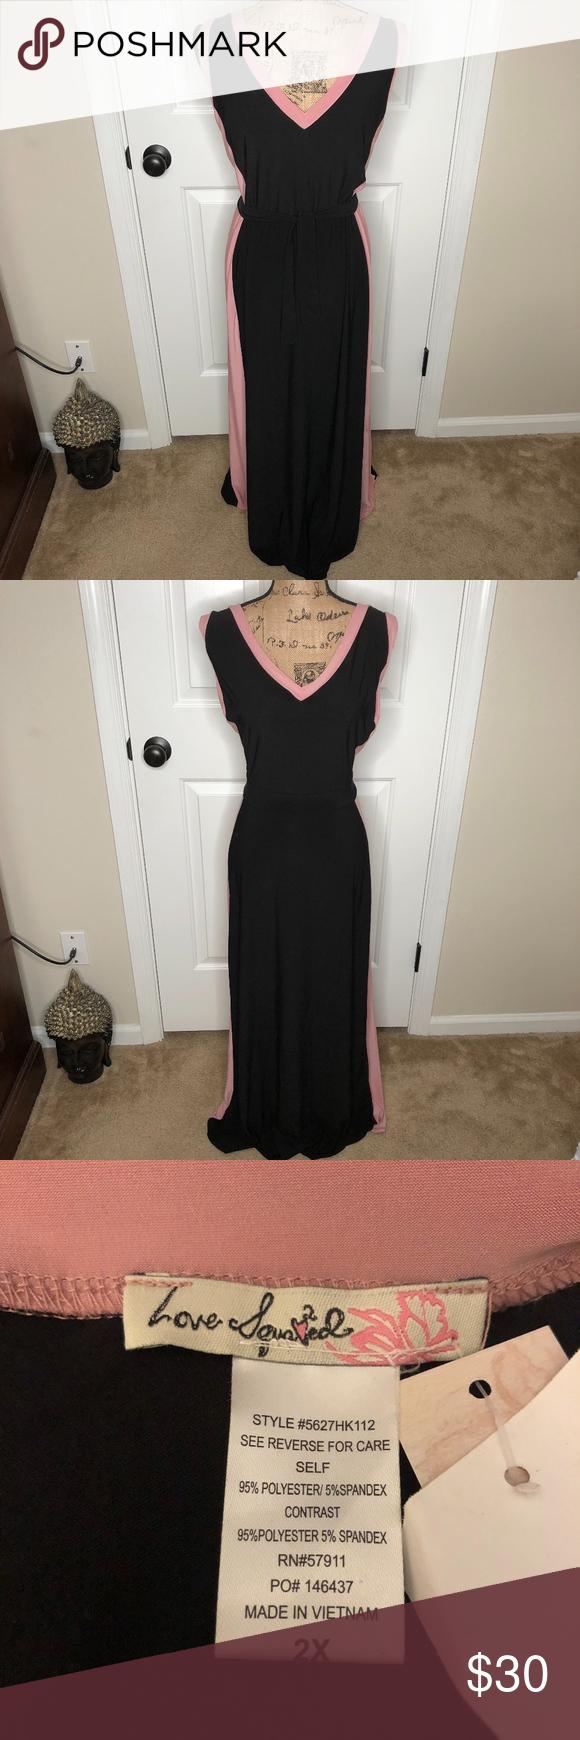 Love Squared Summer Dress New Size 2x Summer Dresses Dresses Summer Maxi Dress [ 1740 x 580 Pixel ]